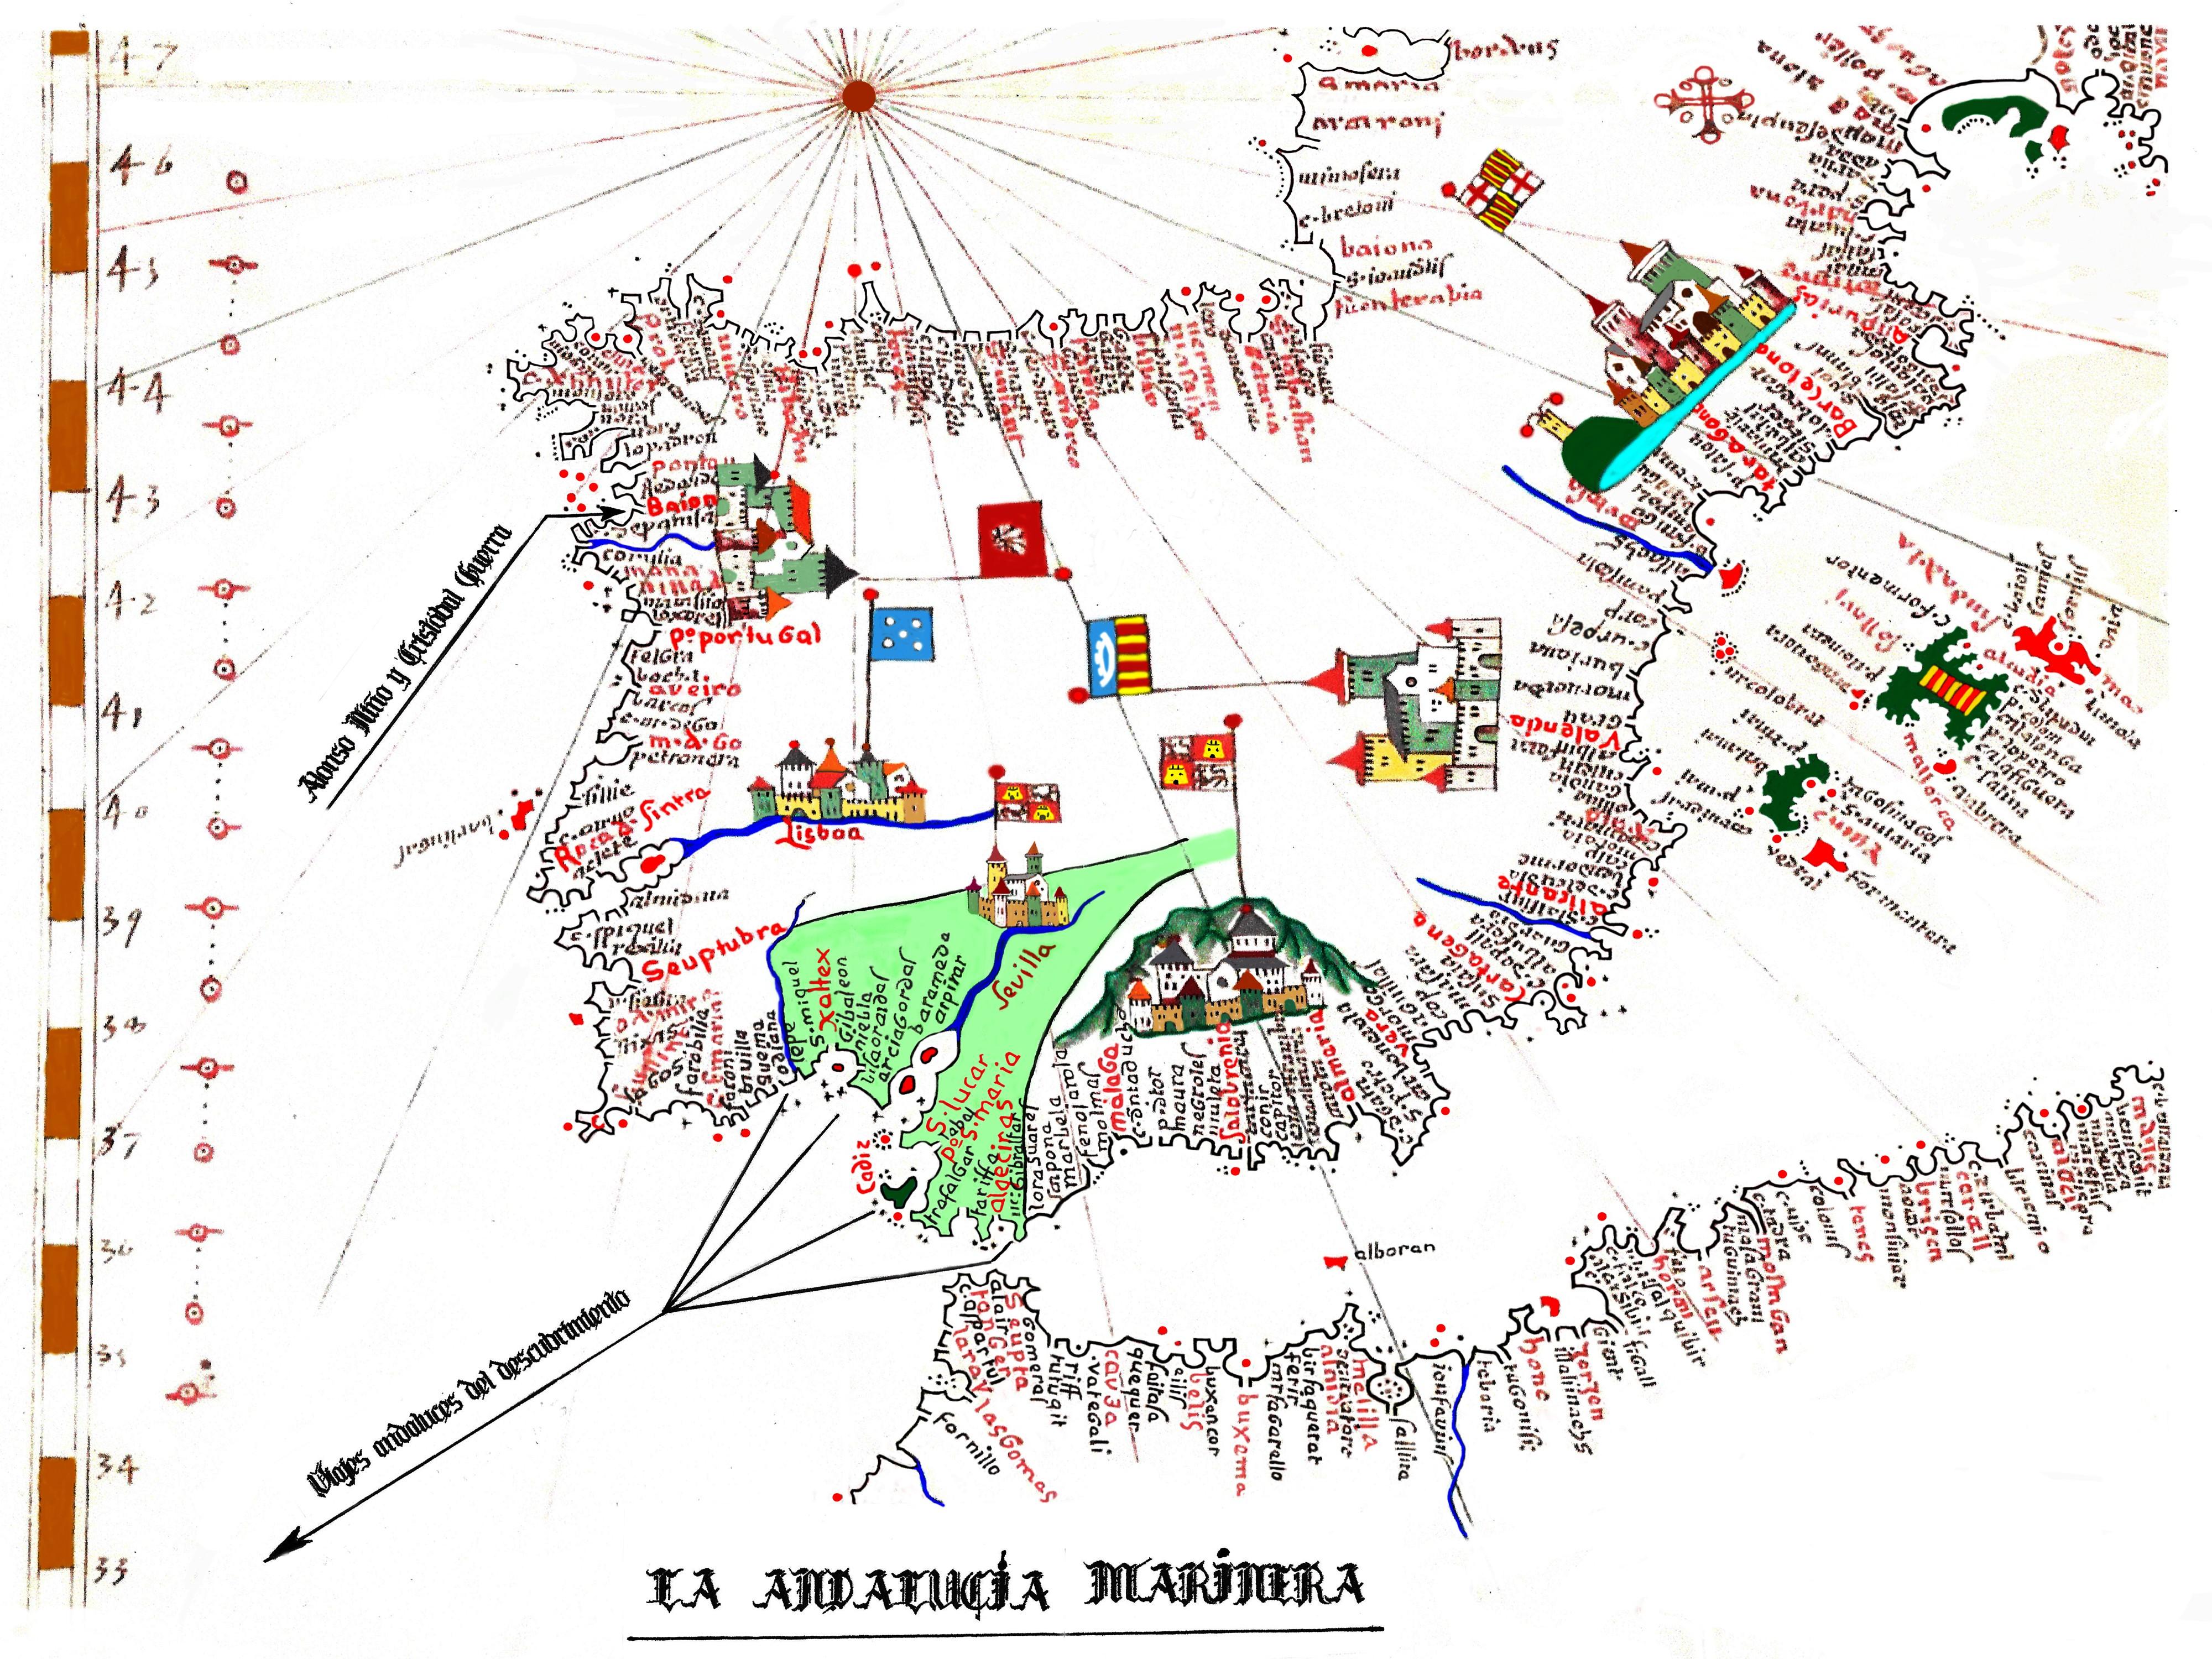 FIG 3 La Baja Andaluca Marinera